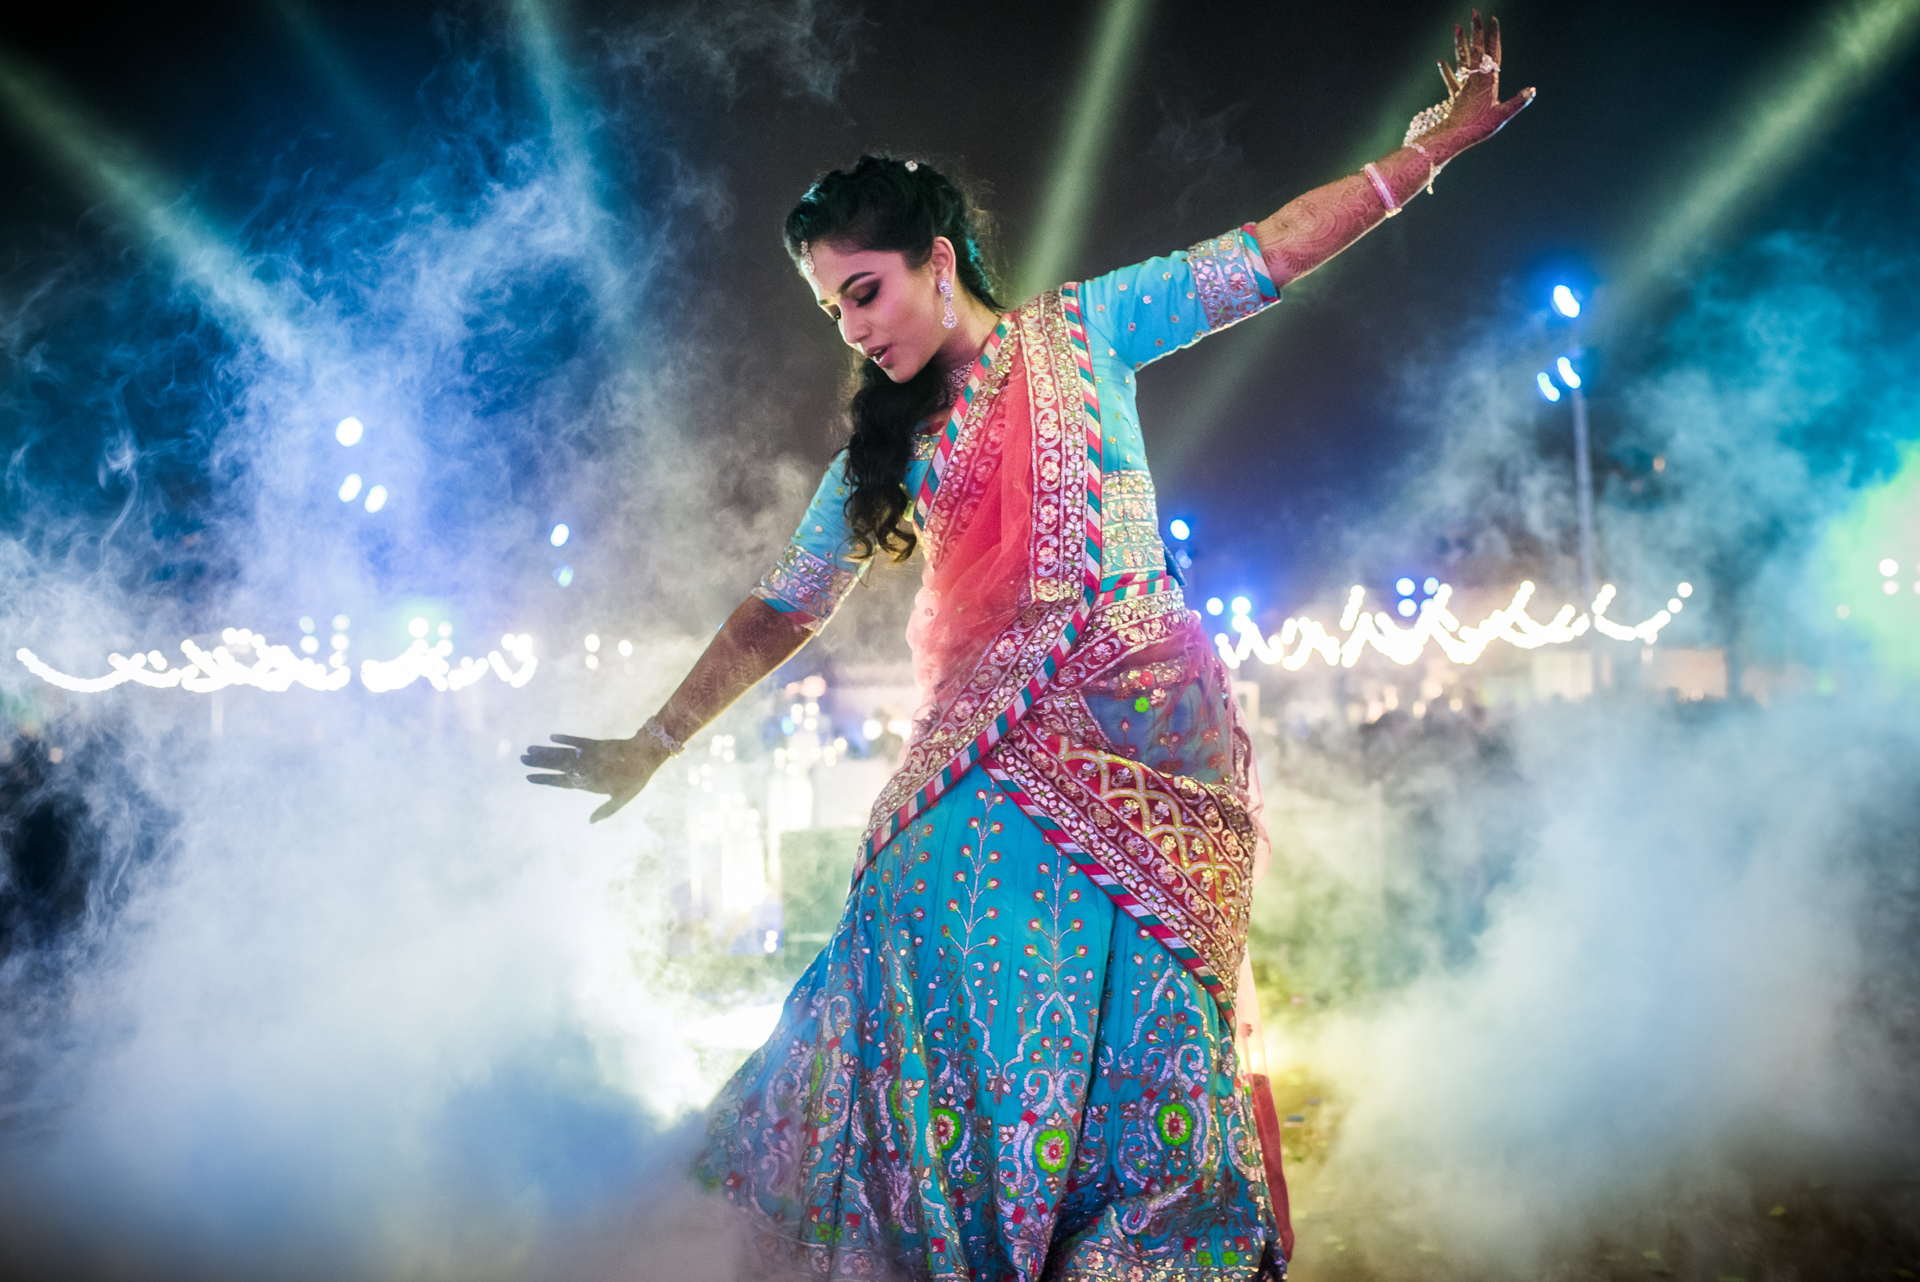 indian-dancer-in-pink-aqua-sari-with-spotlight-behind-worlds-best-wedding-photos-sephi-bergerson-bengaluru-wedding-photographers